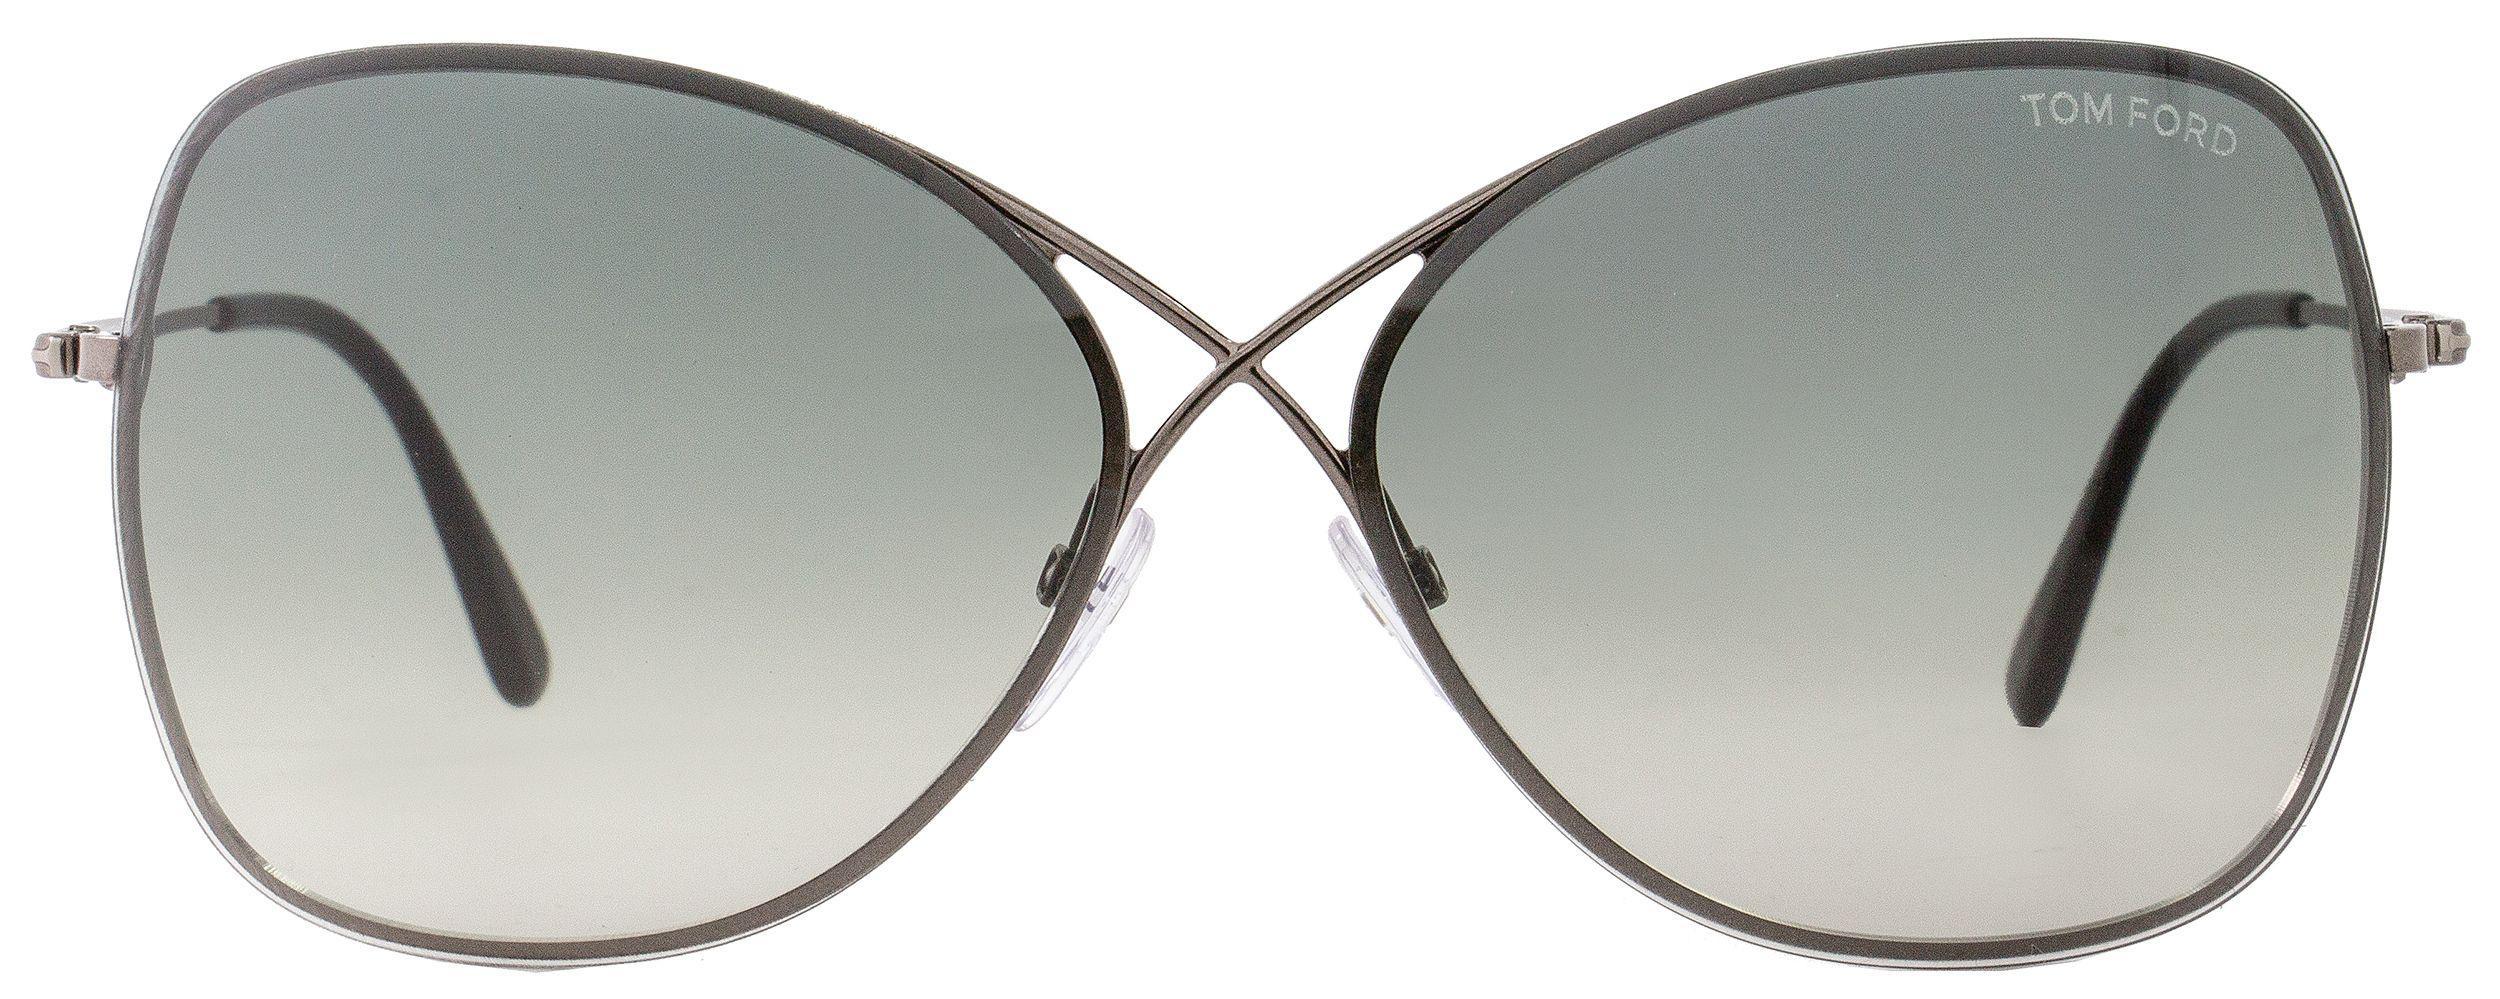 fd21d6e7d0b74 Tom Ford FT0250 Colette Source · Tom Ford Butterfly Sunglasses Tf250 Colette  08c Gunmetal black 63mm